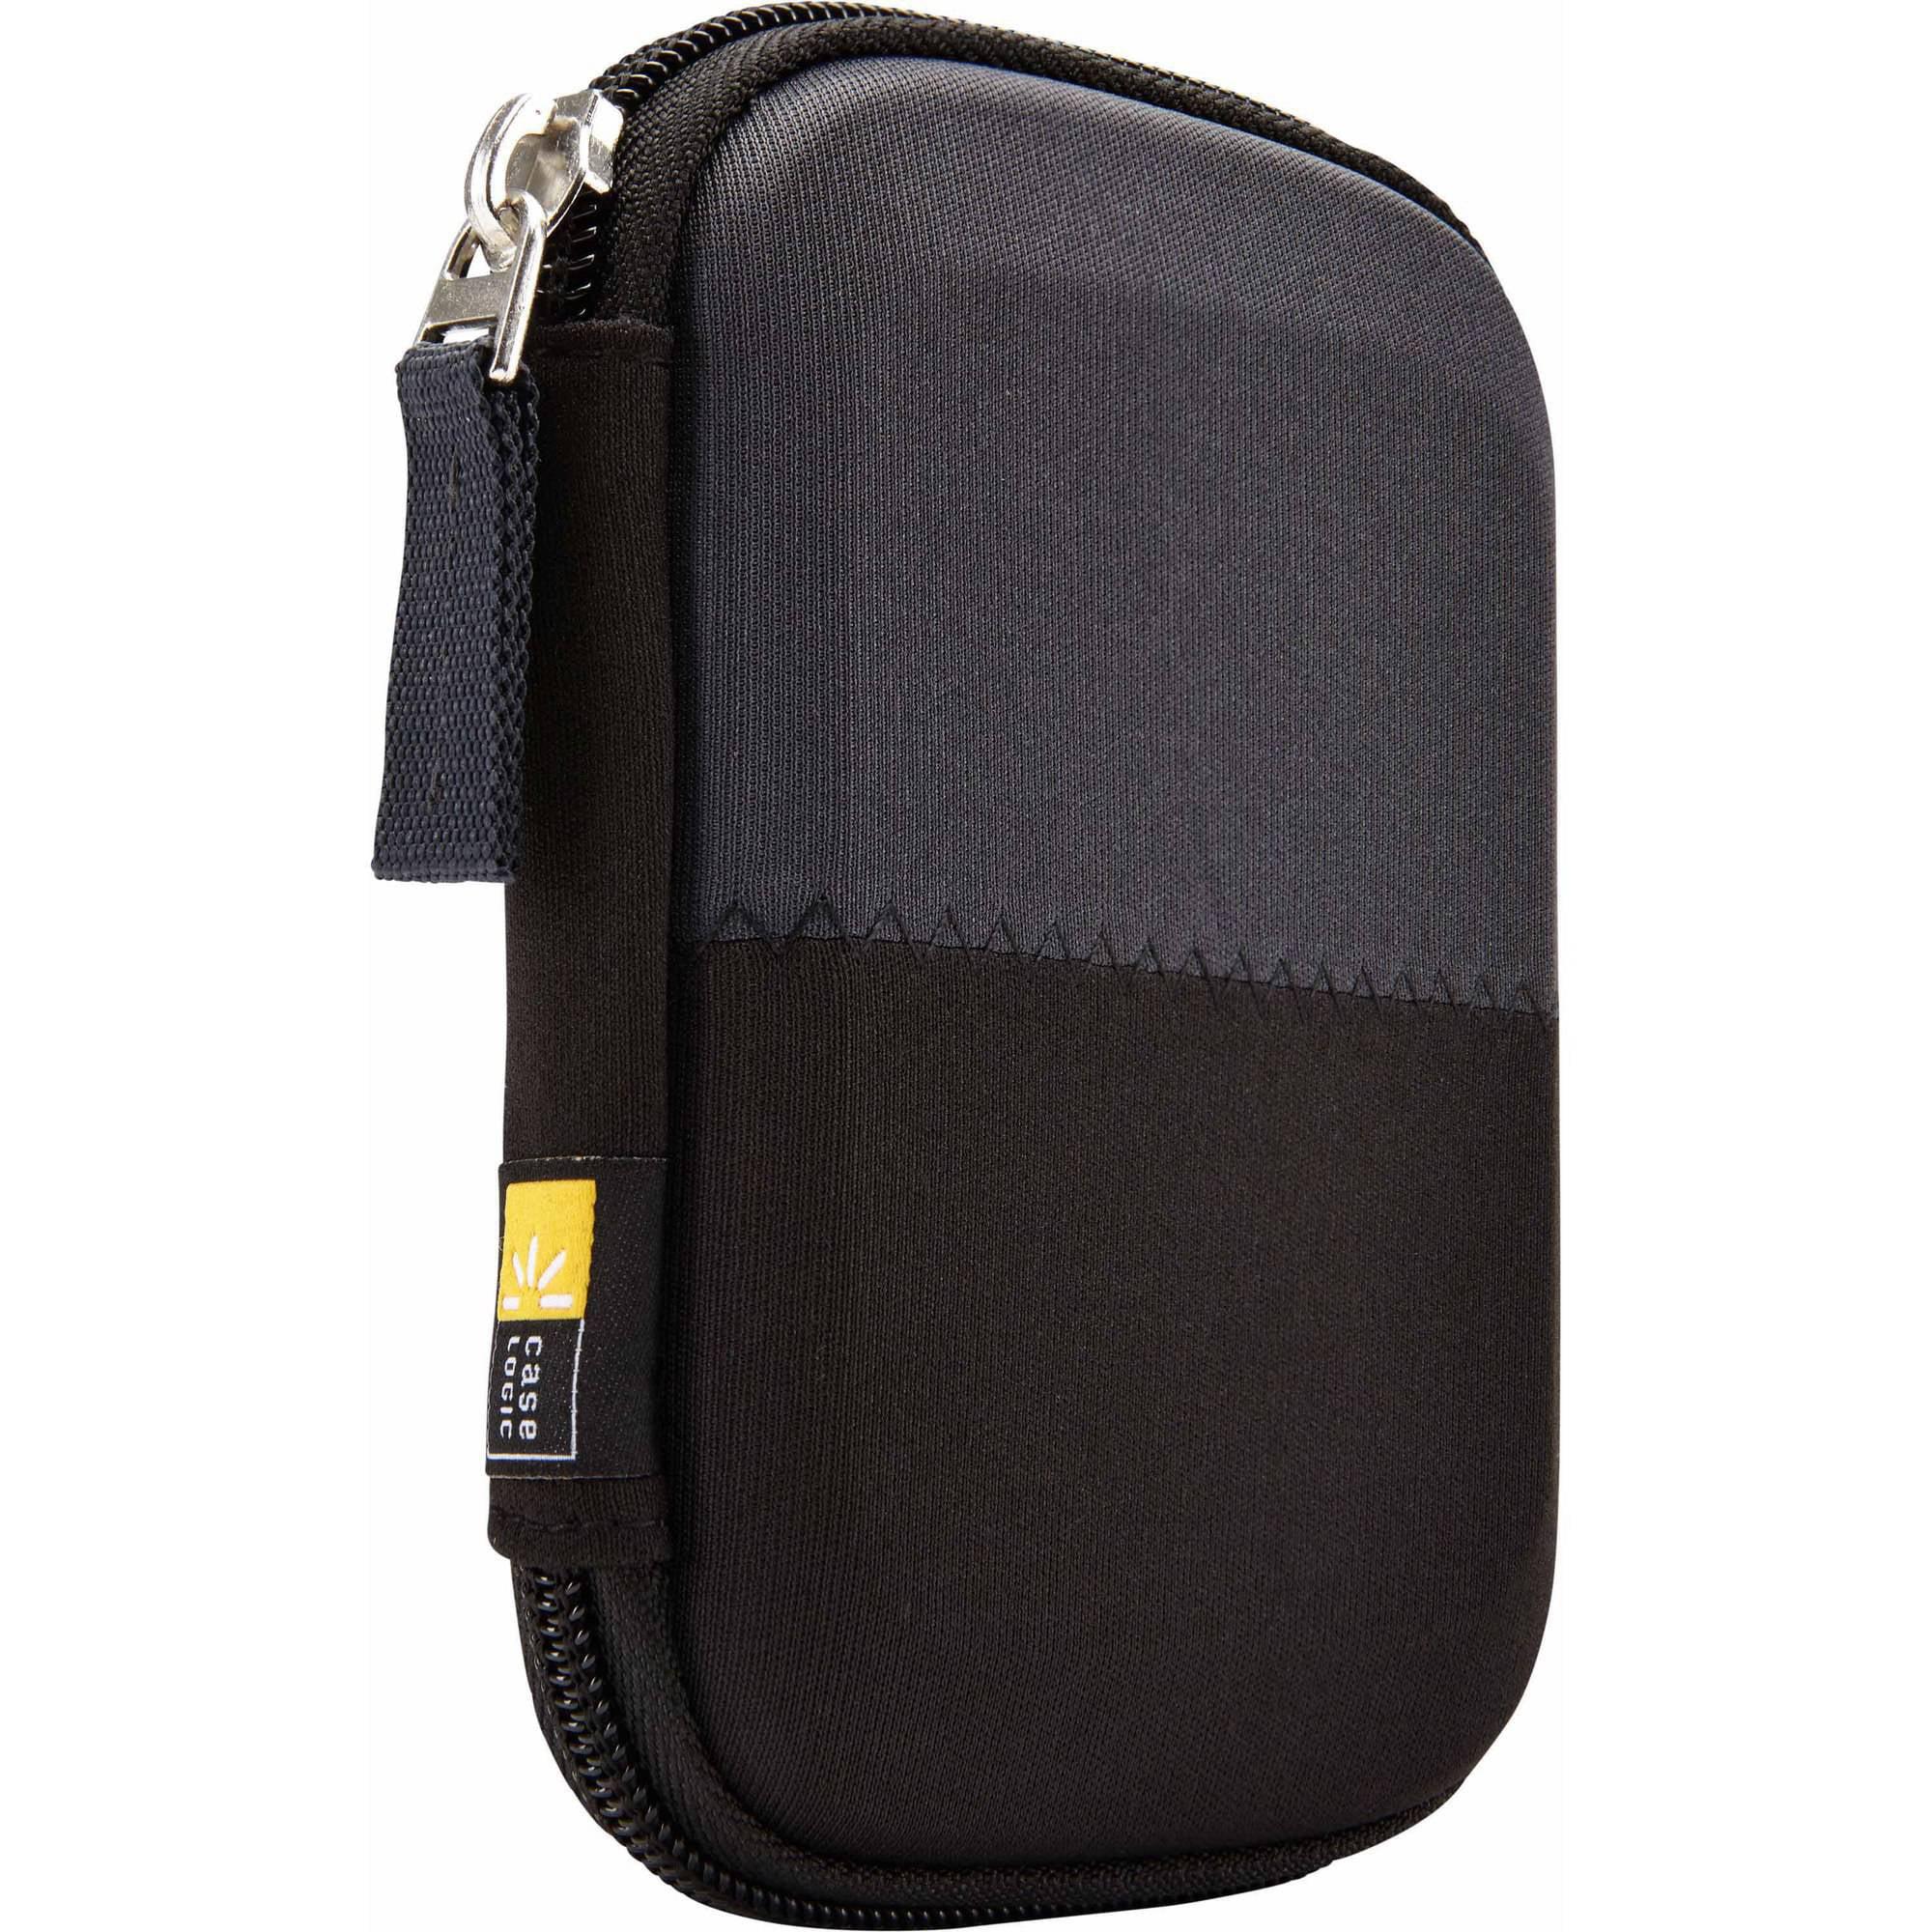 Case Logic HDC-11 Portable Hard Drive Case, Black